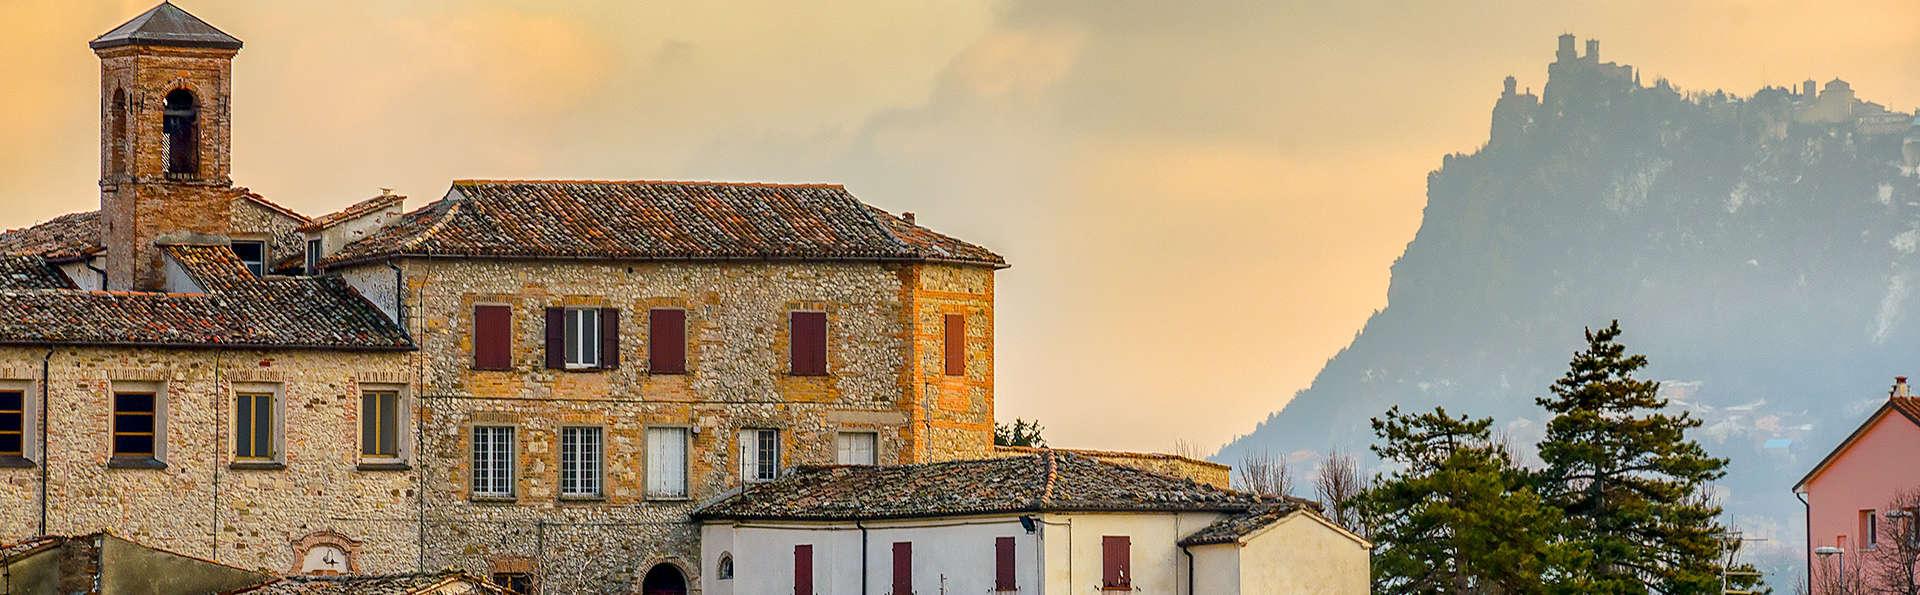 Hotel Villa Adriatica - Edit_Rimini2.jpg